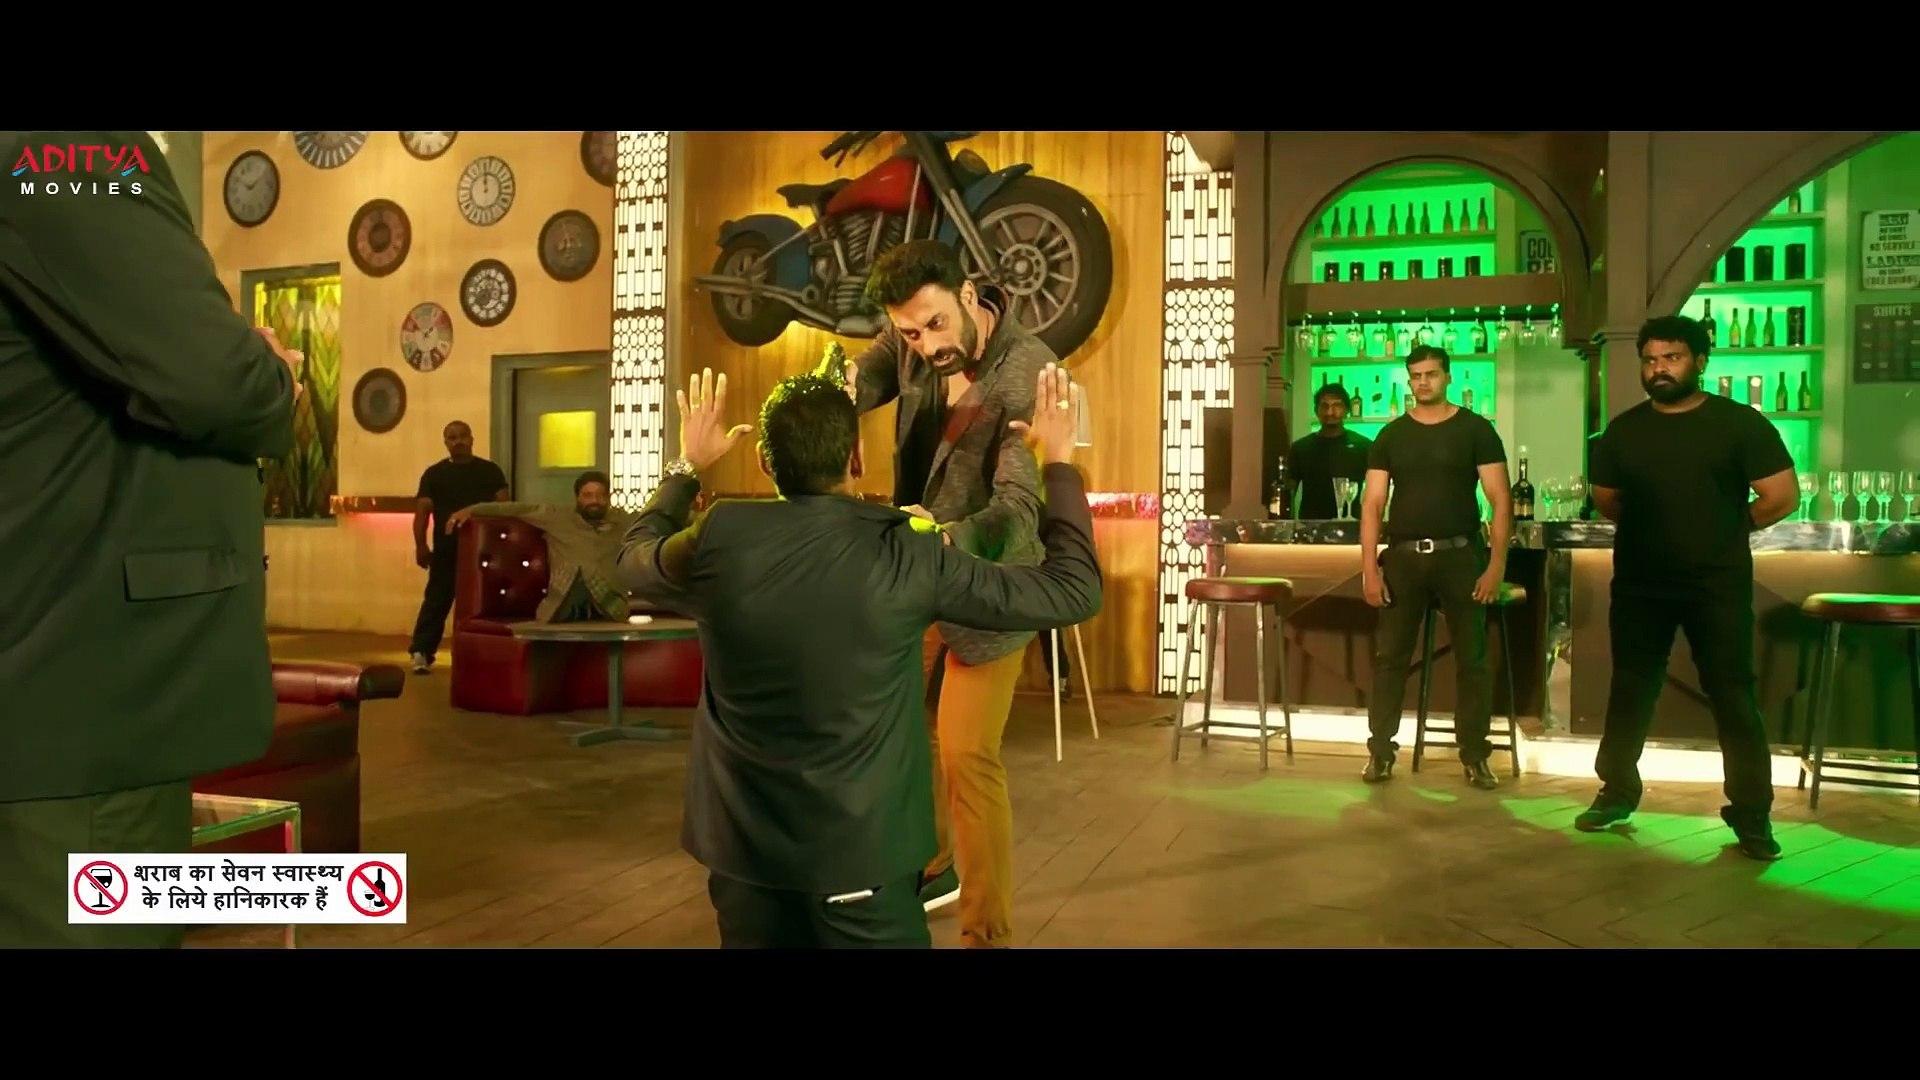 Intelligent 2019 New Released Full Hindi Dubbed Movie ¦ Sai Dharam Tej ¦ Lavanya Tripathi part two (